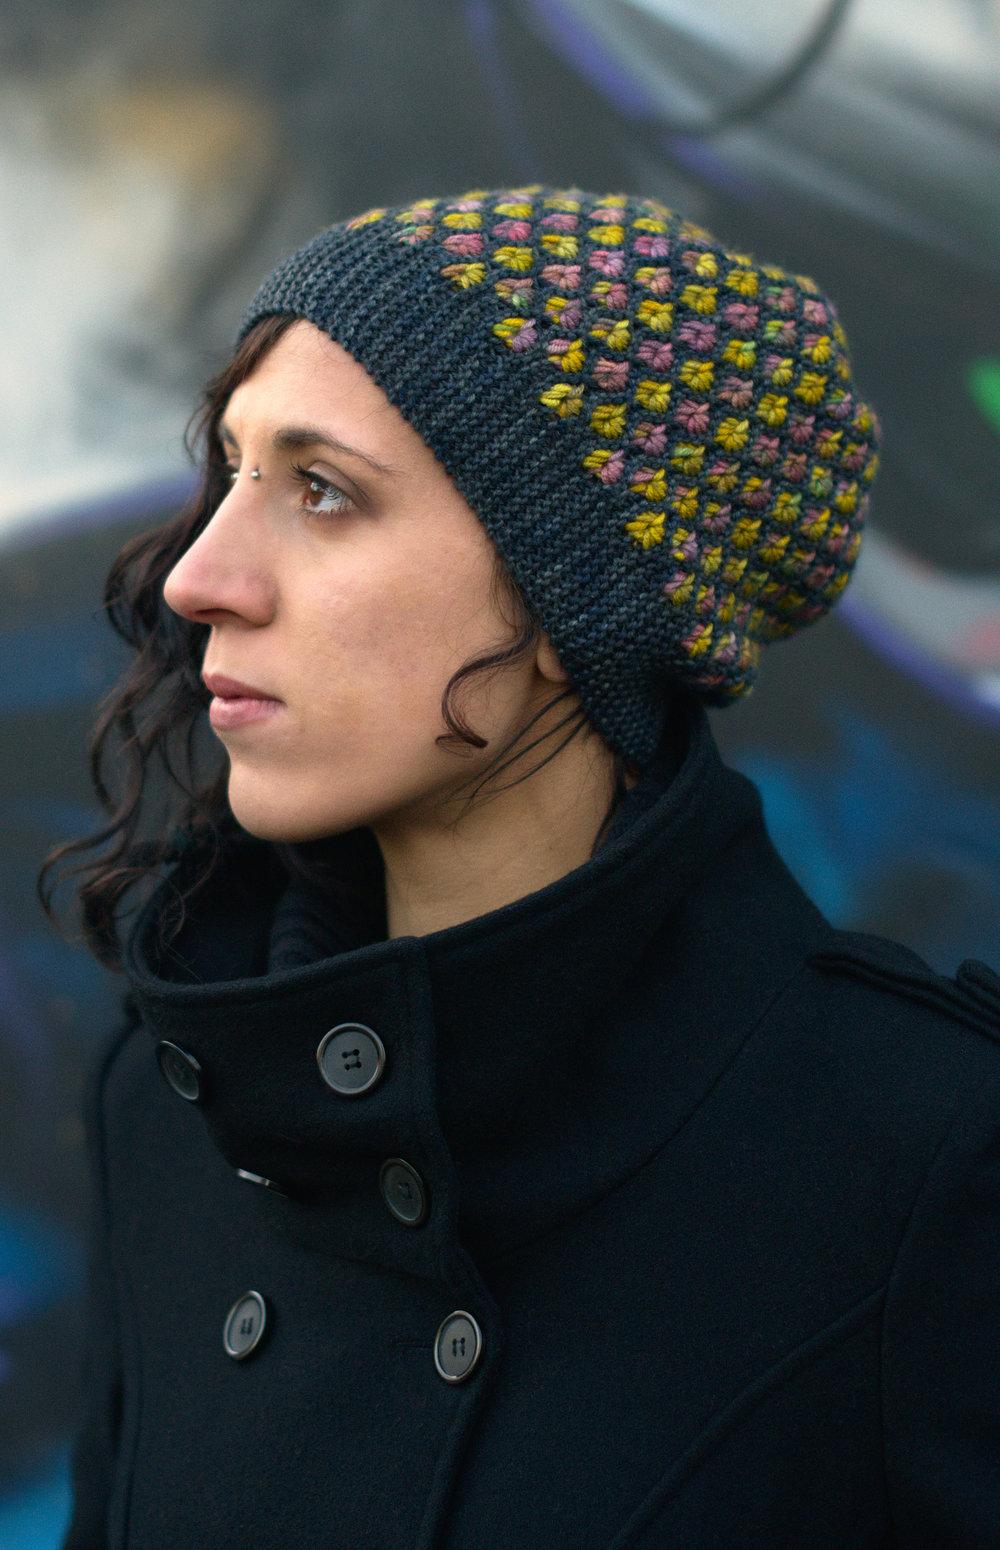 Klastar sideways knit slouchy Hat hand knitting pattern for hand-dyed DK yarns